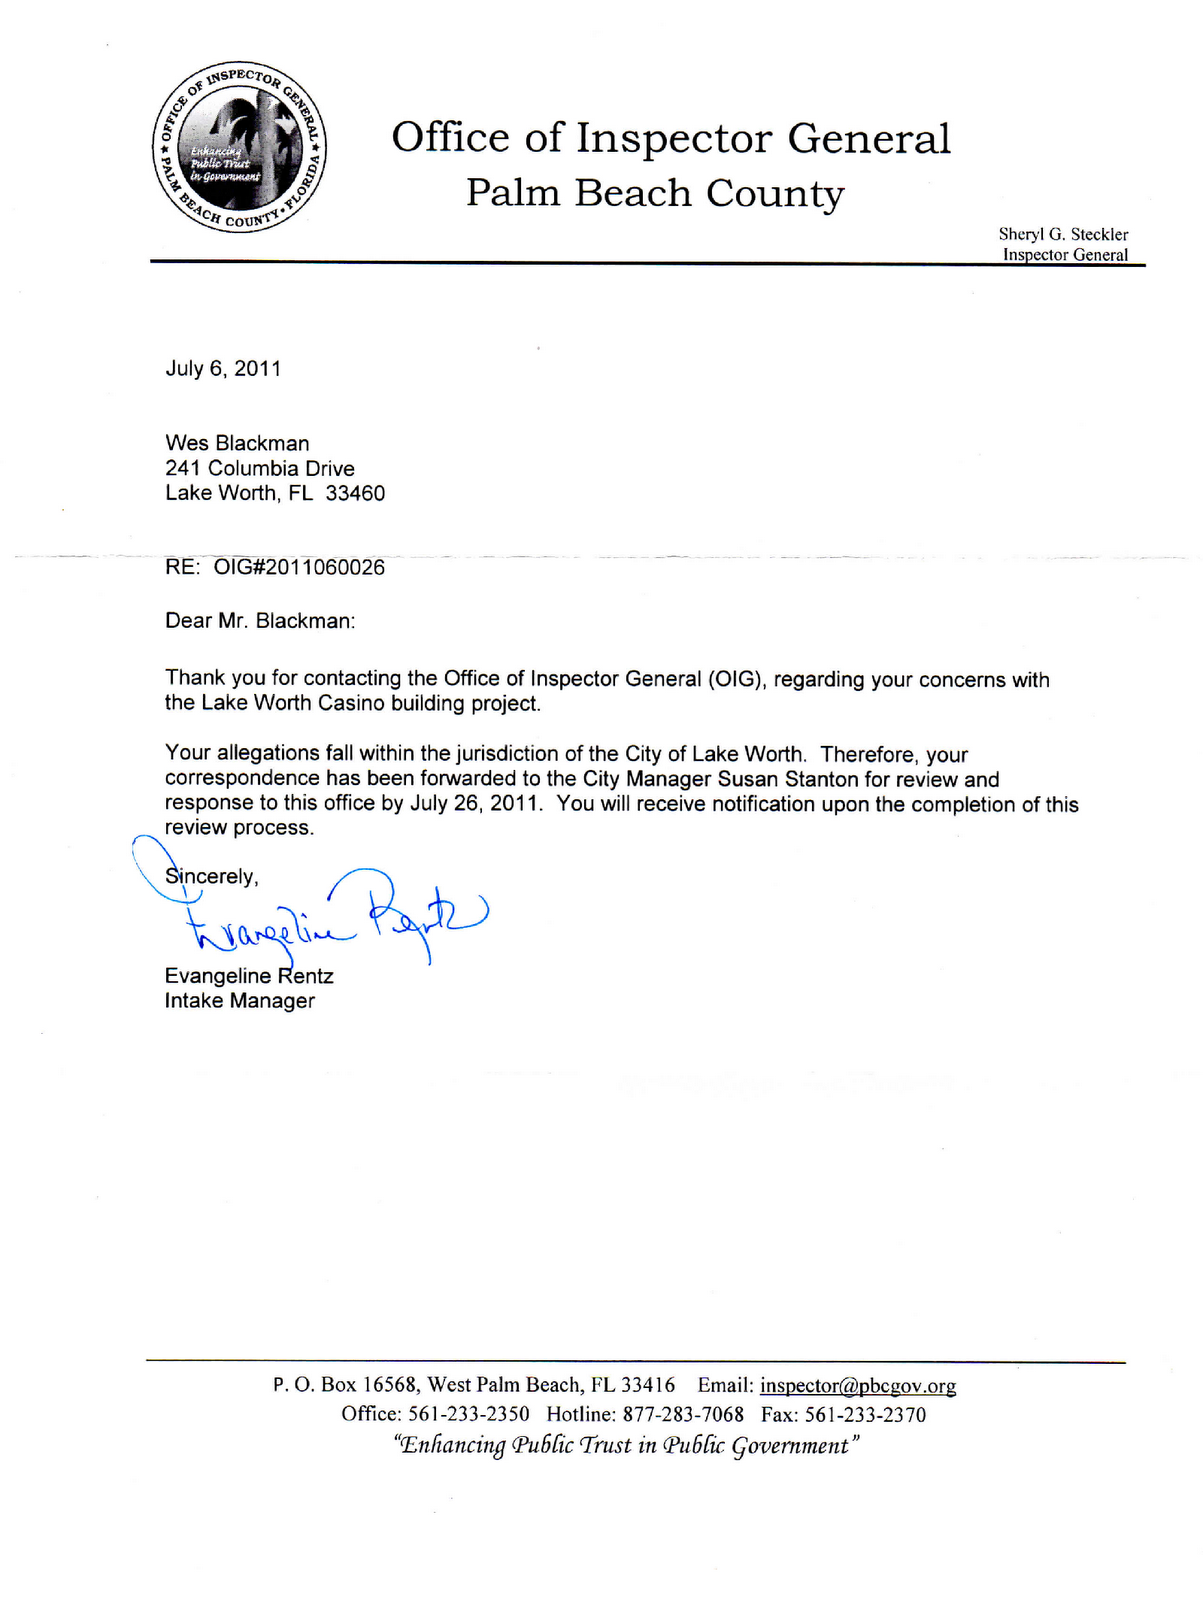 Sample Of Acknowledgement Letter For Sending Documents